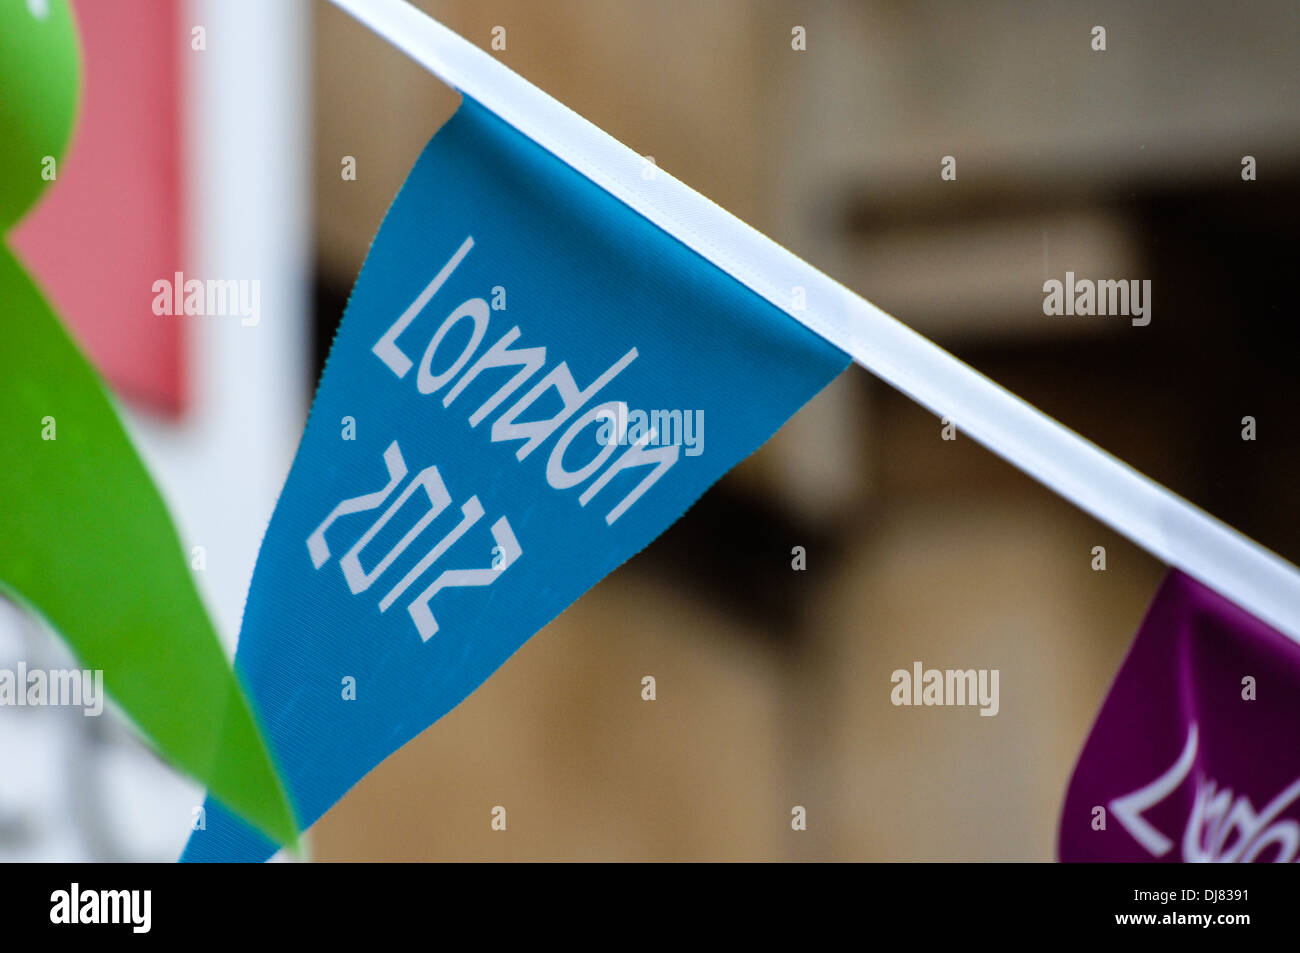 London 2012 Olympic flag banner - Stock Image